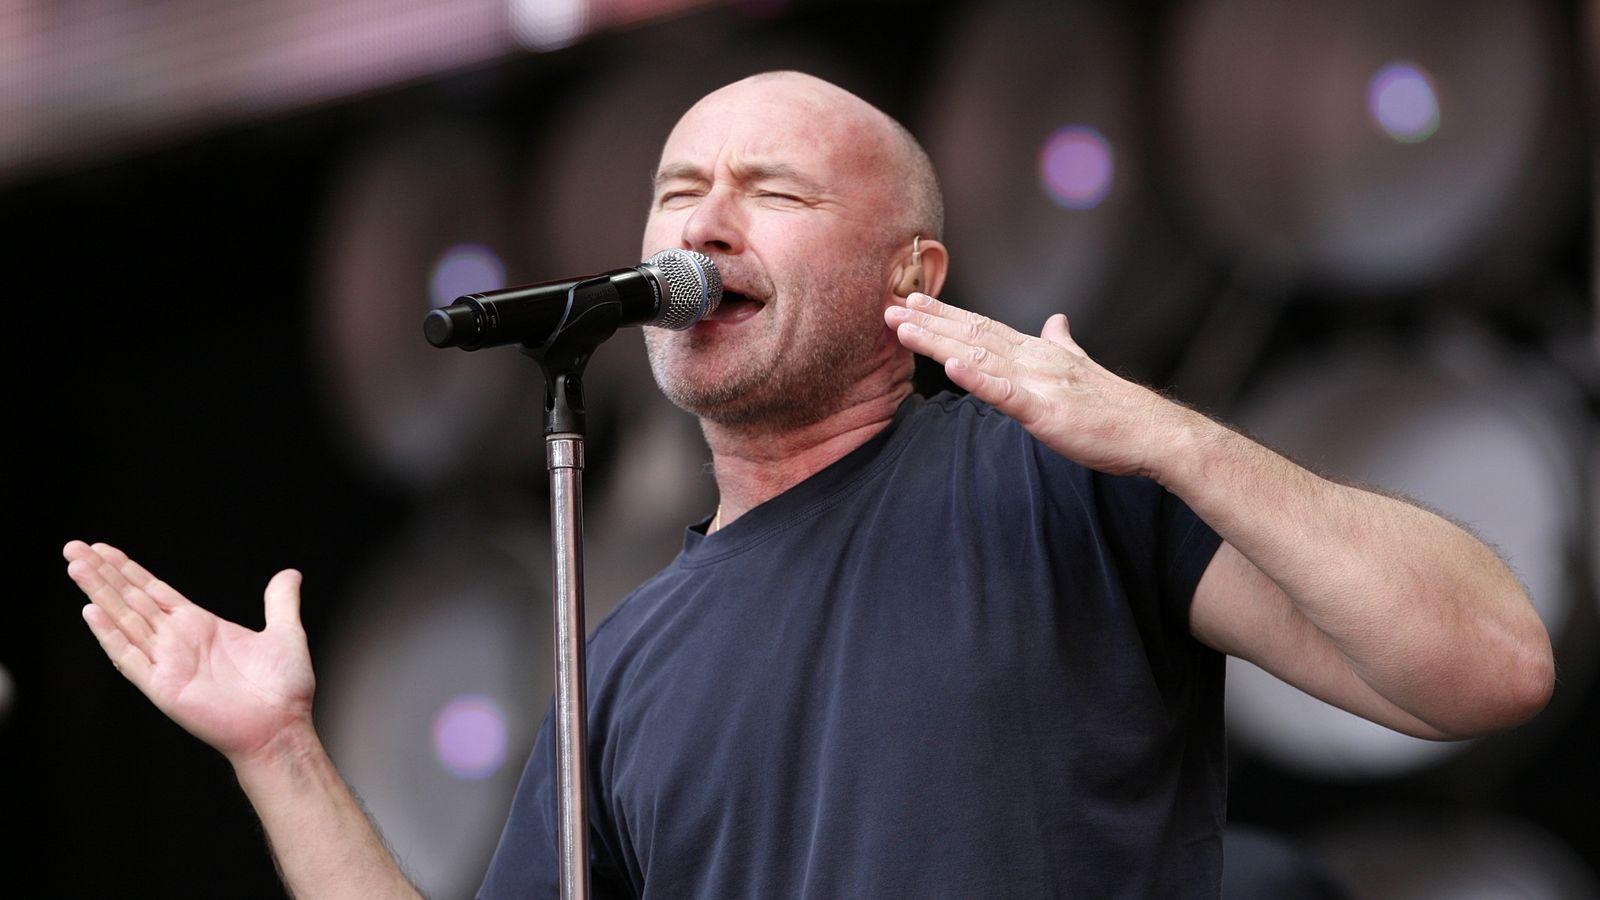 'The Phil Collins Effect': Older pop stars given hope by former Genesis singer's cultural resurrection